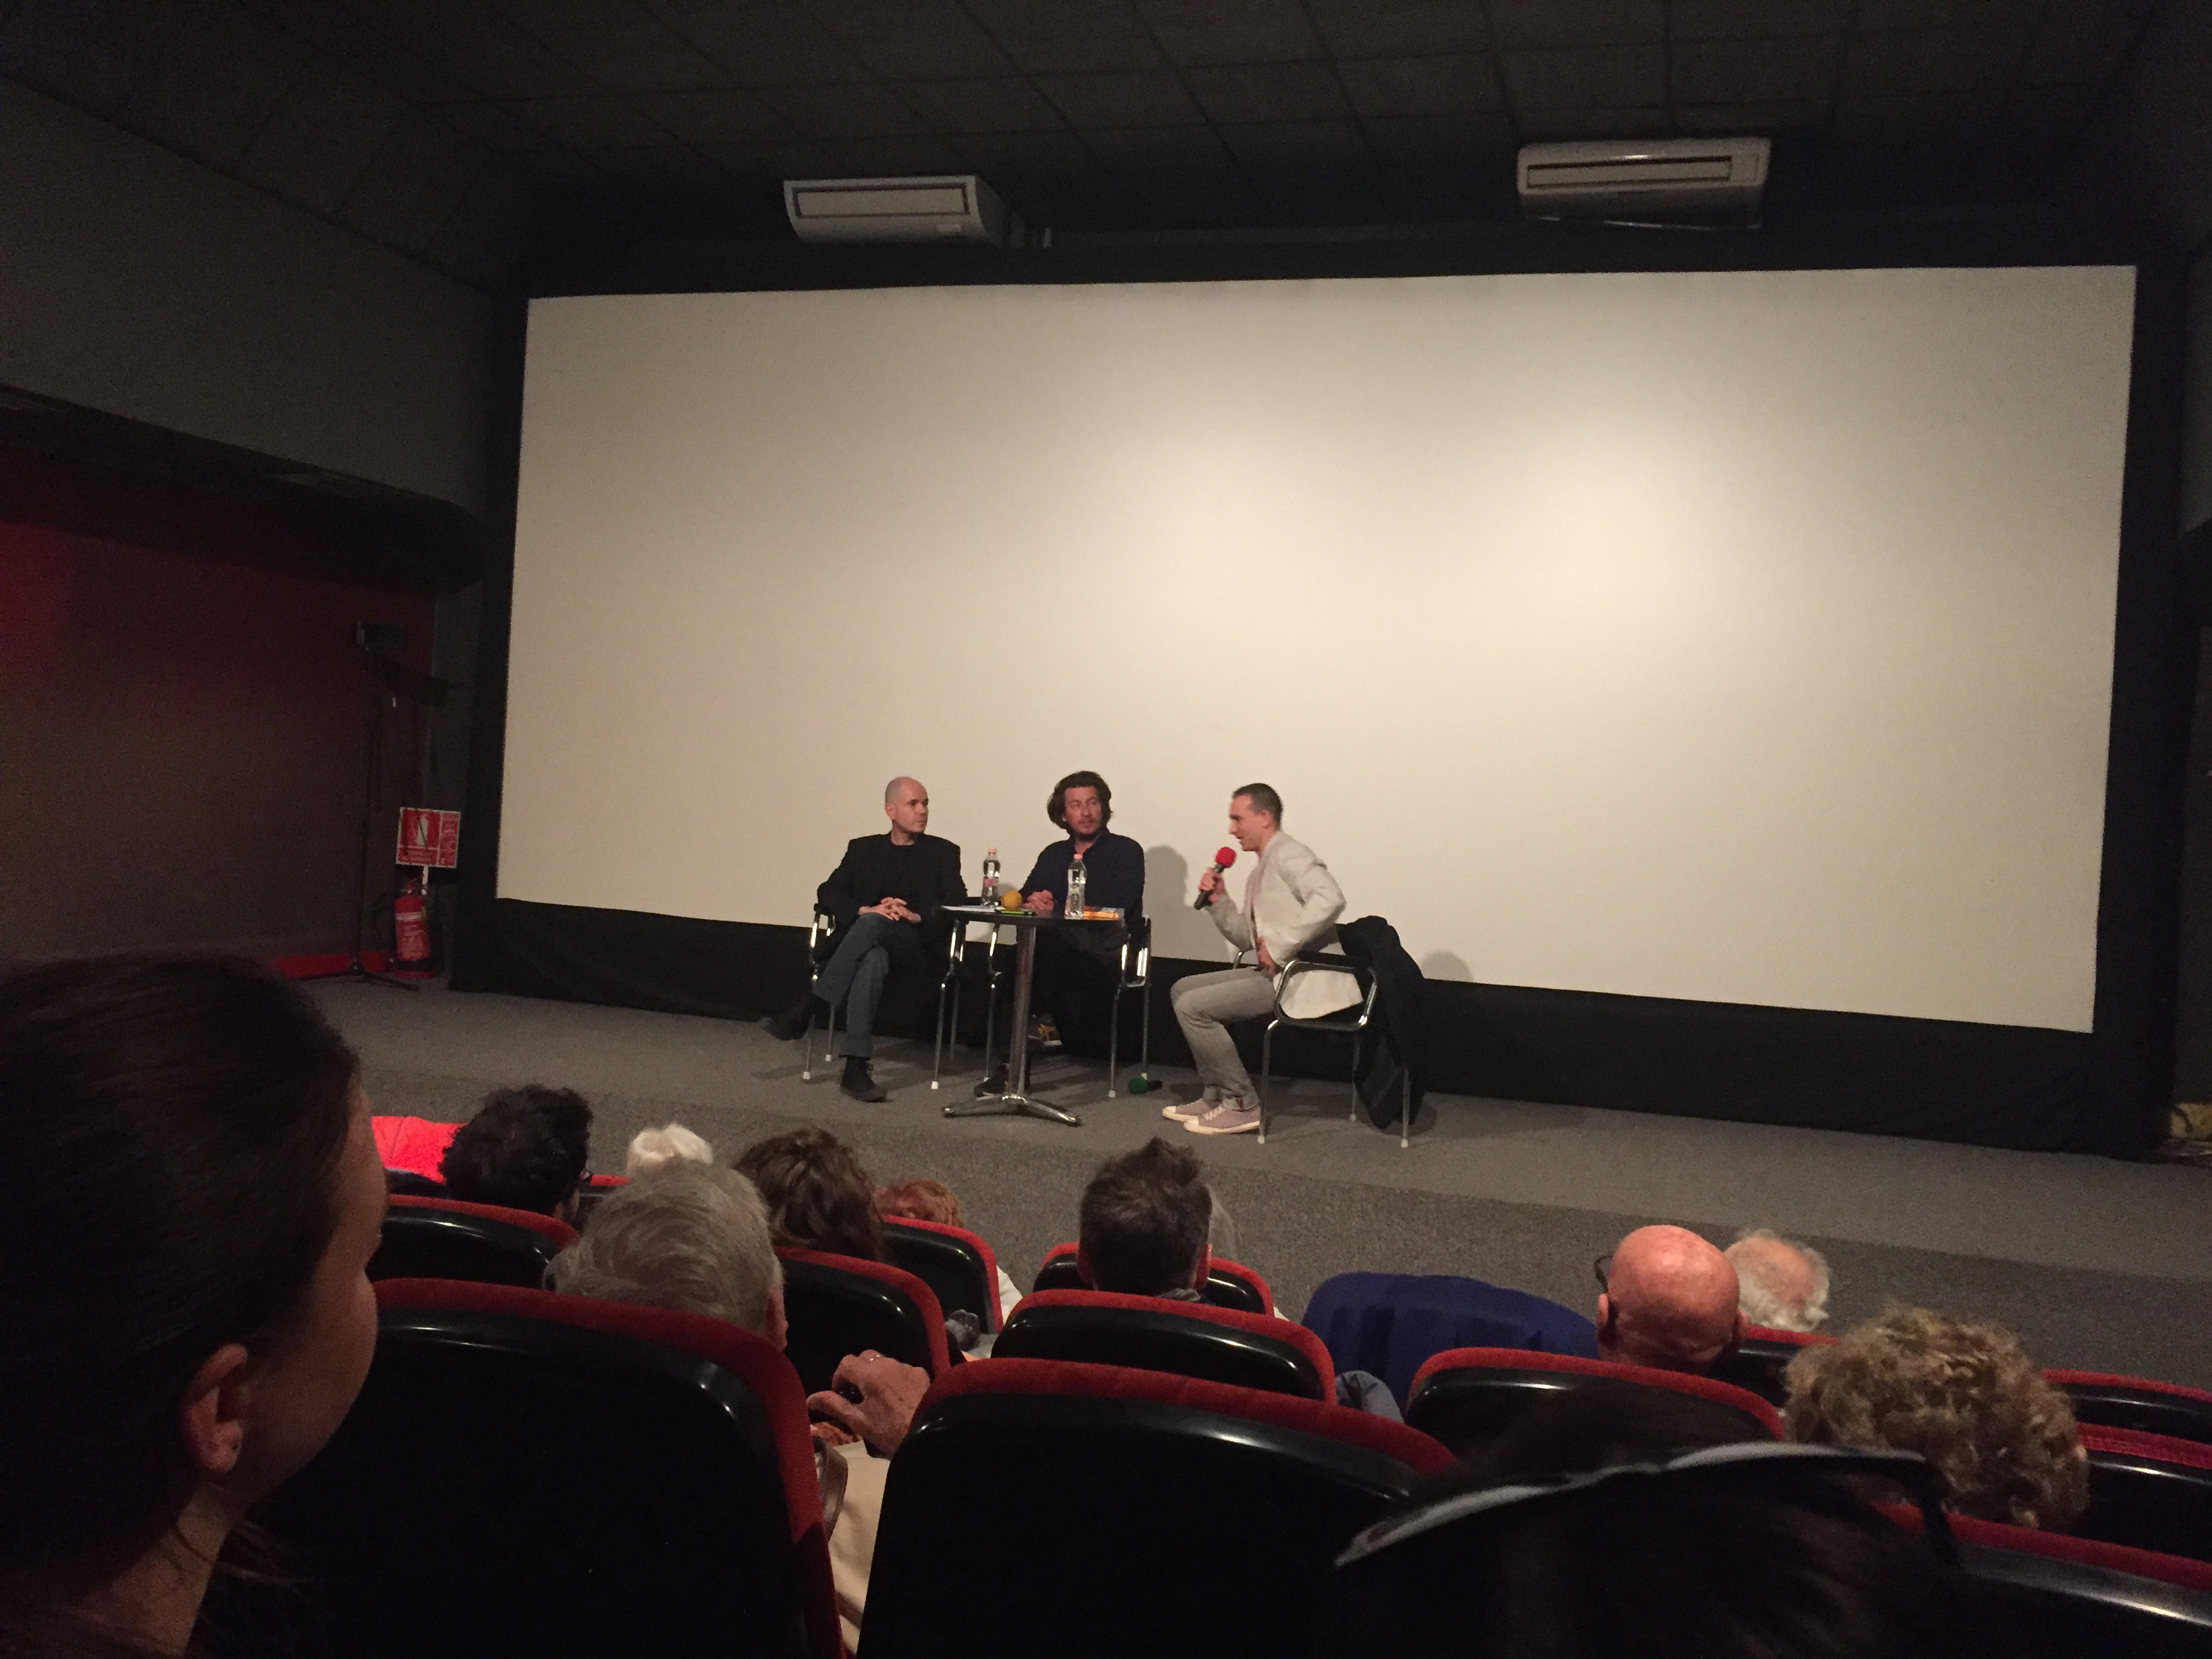 From left: Gabor T Szanto, Ferenc Torok, moderator Gergo Body